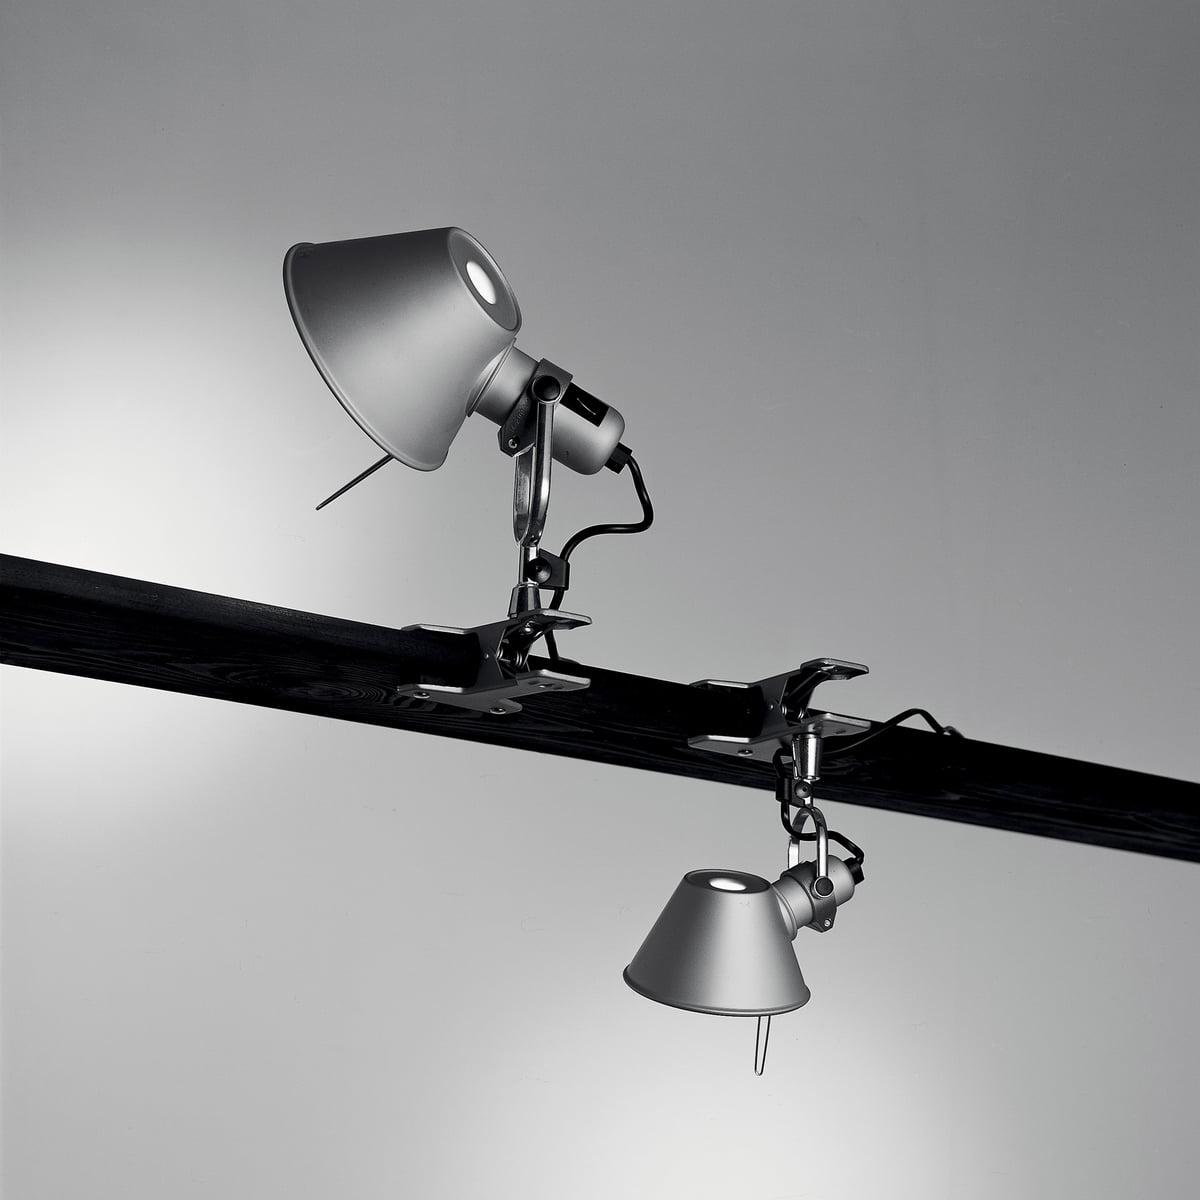 tolomeo pinza clipon led light by artemide - artemide tolomeo  pinza clamp lamp